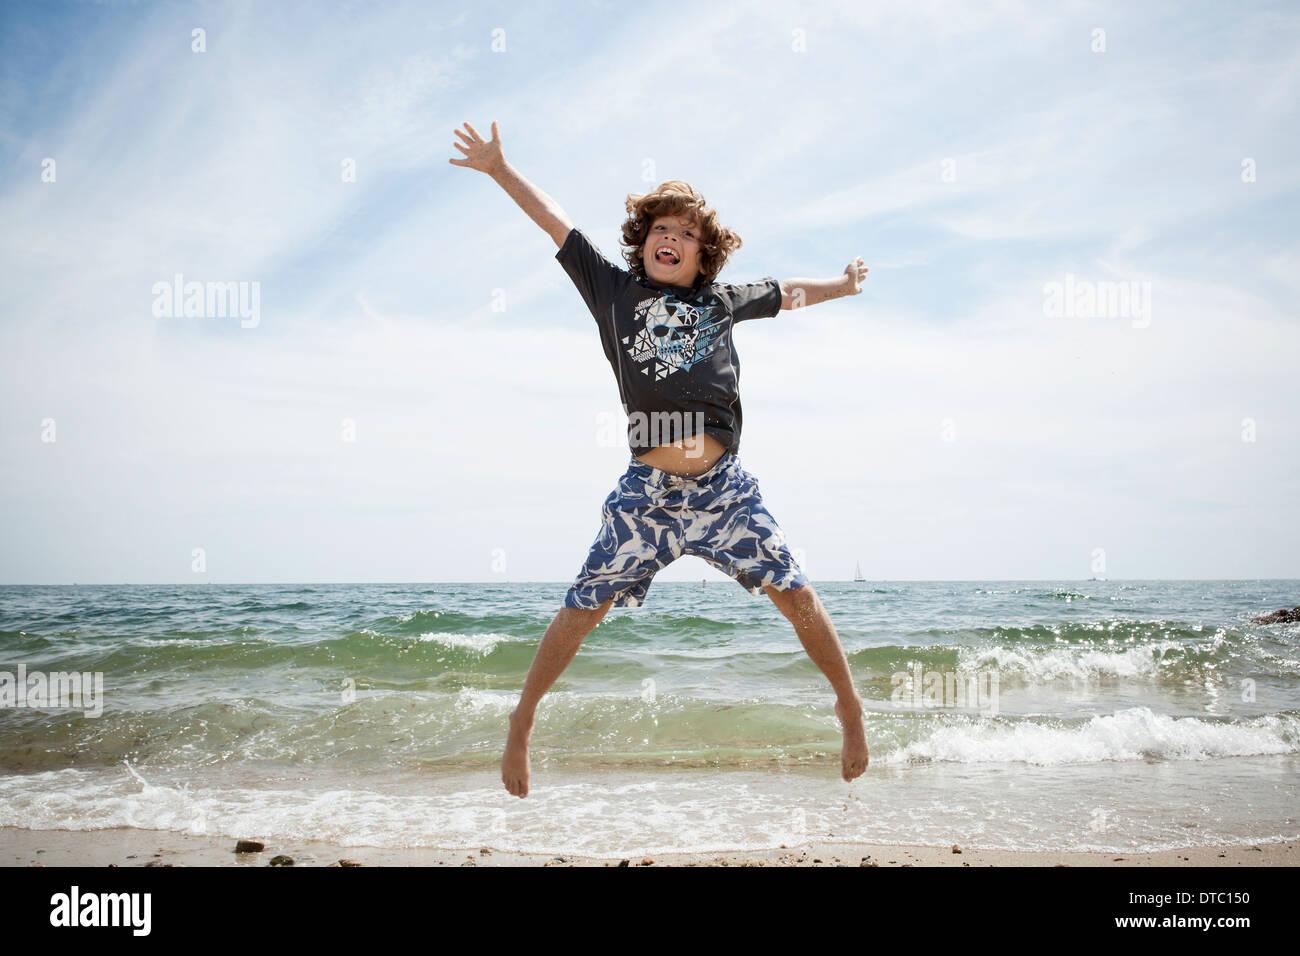 Retrato informal de Salto Chico en la playa en Falmouth, Massachusetts, EE.UU. Imagen De Stock